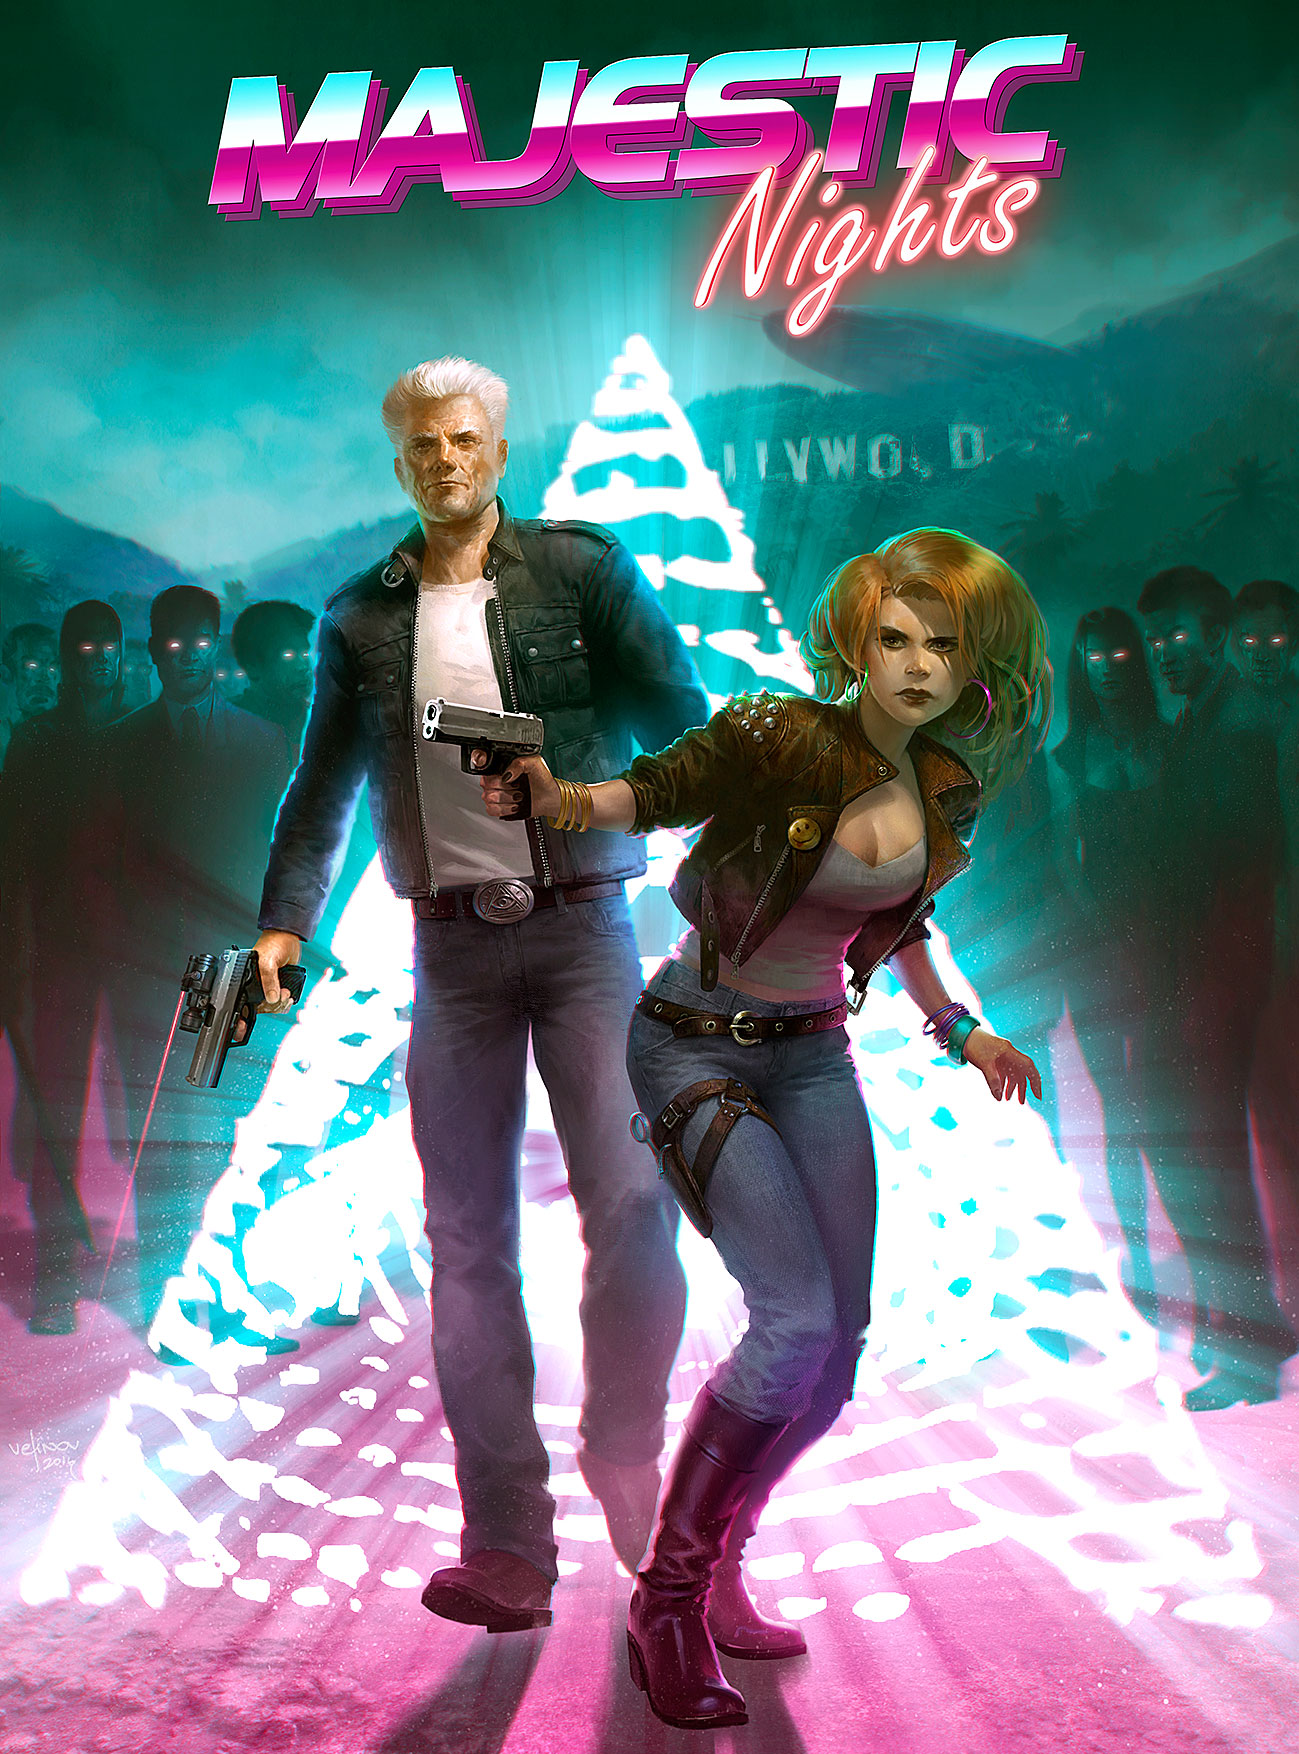 Majestic-Nights-poster by velinov